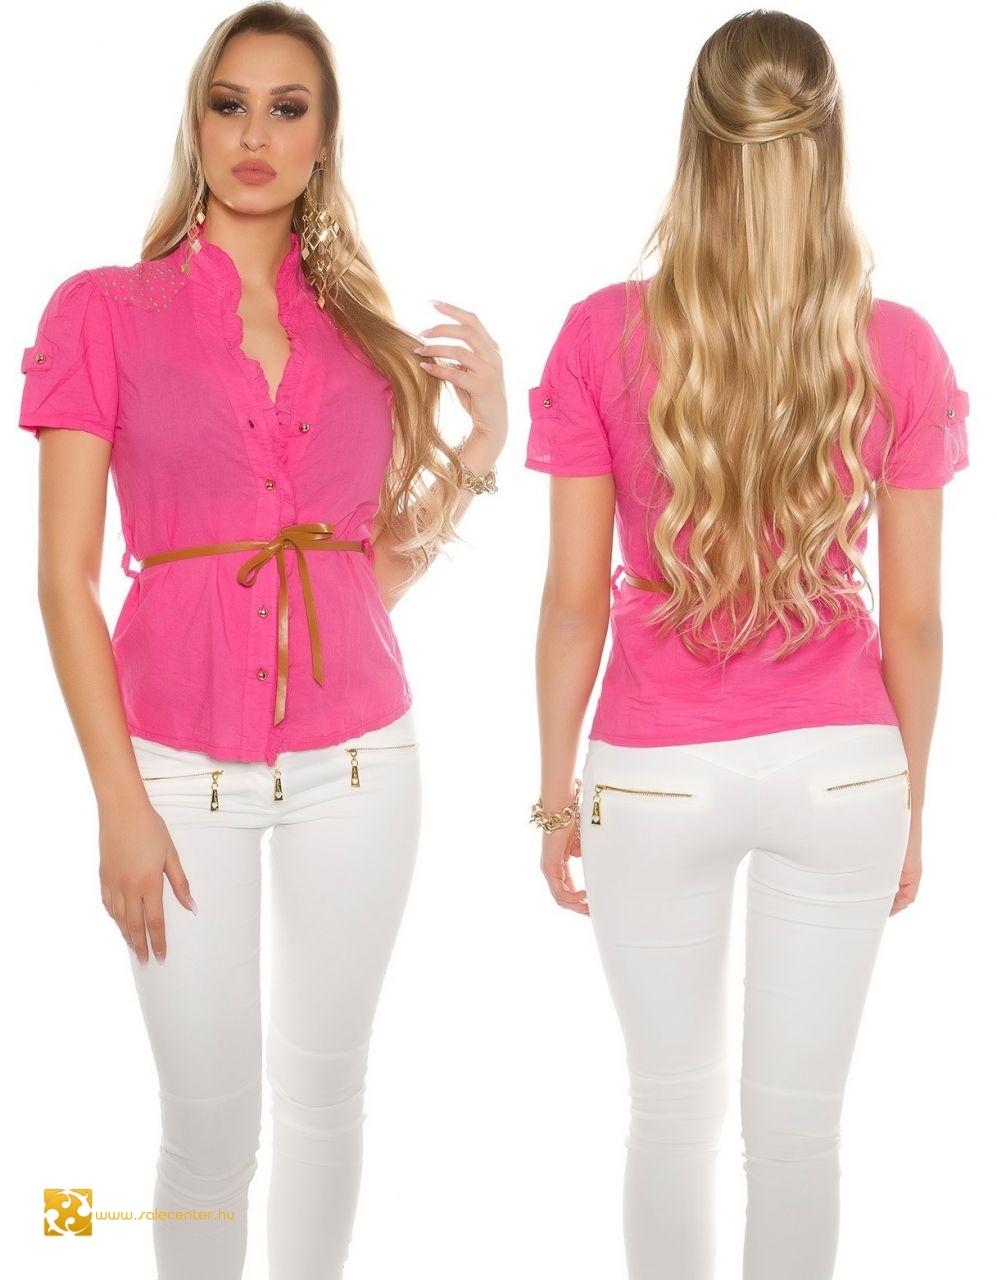 c06005c379 ing, strasszköves vállú ing, divatos női ing, szexi női ing